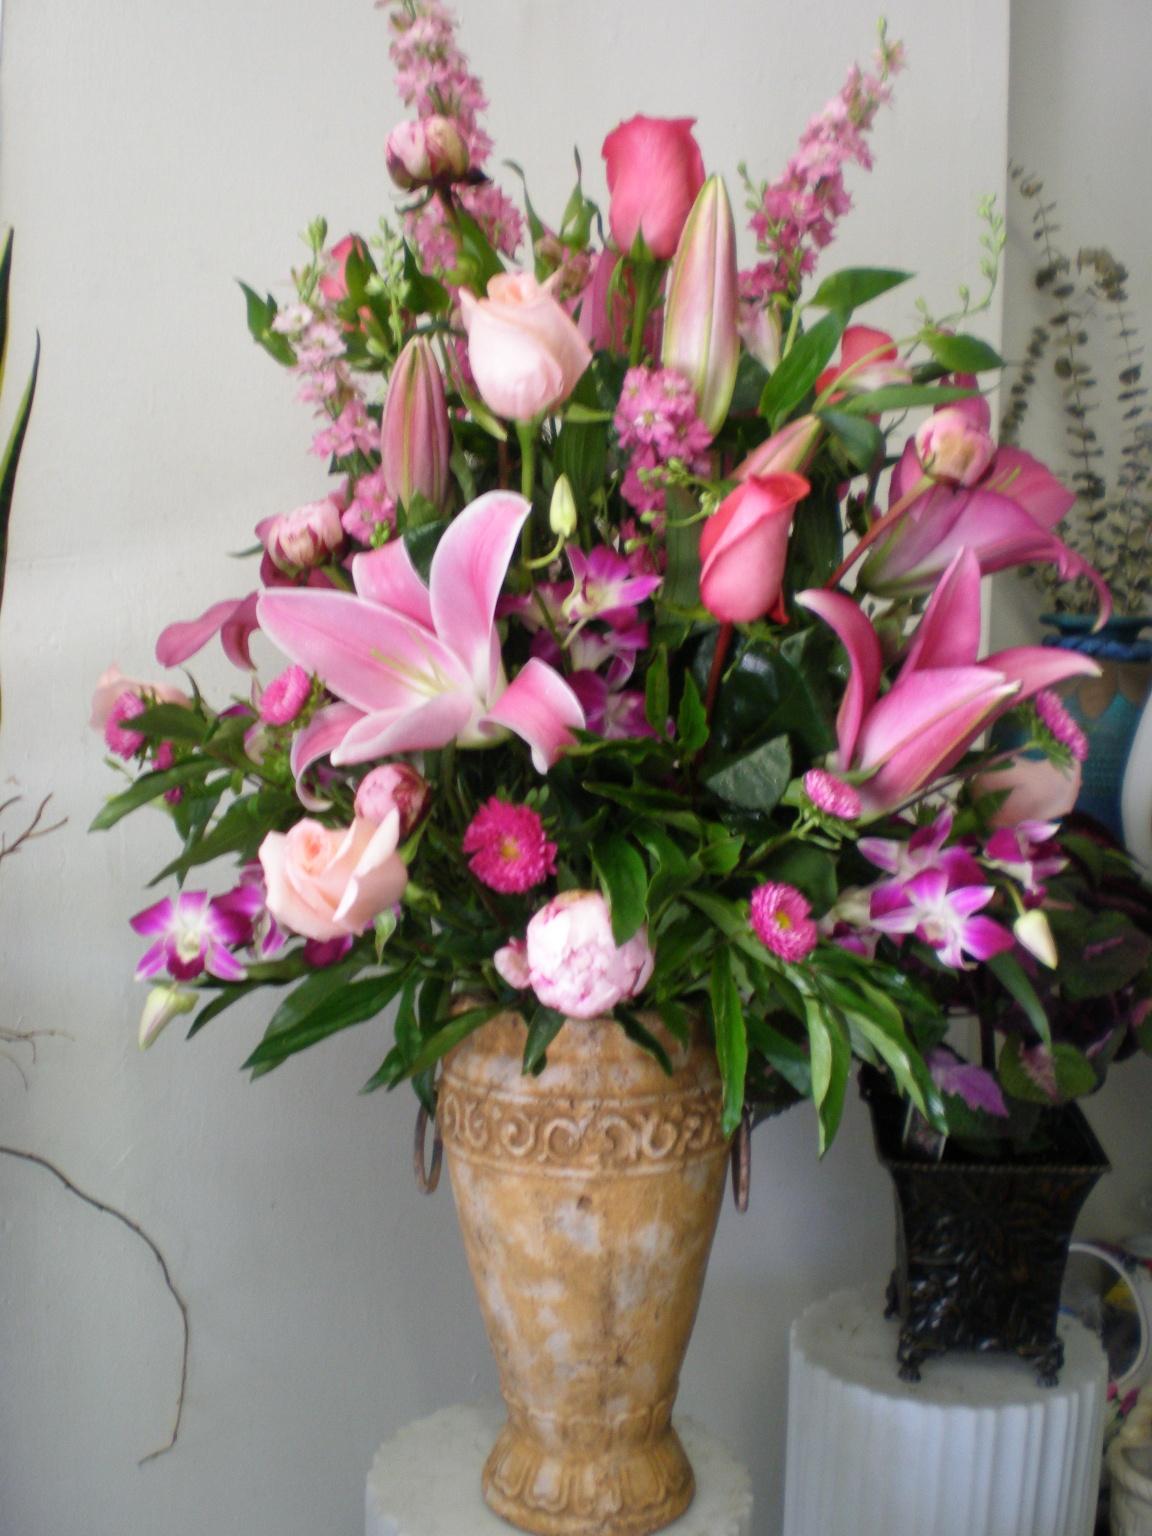 Hummingbird Flower Arrangement This Flower Arrangement is